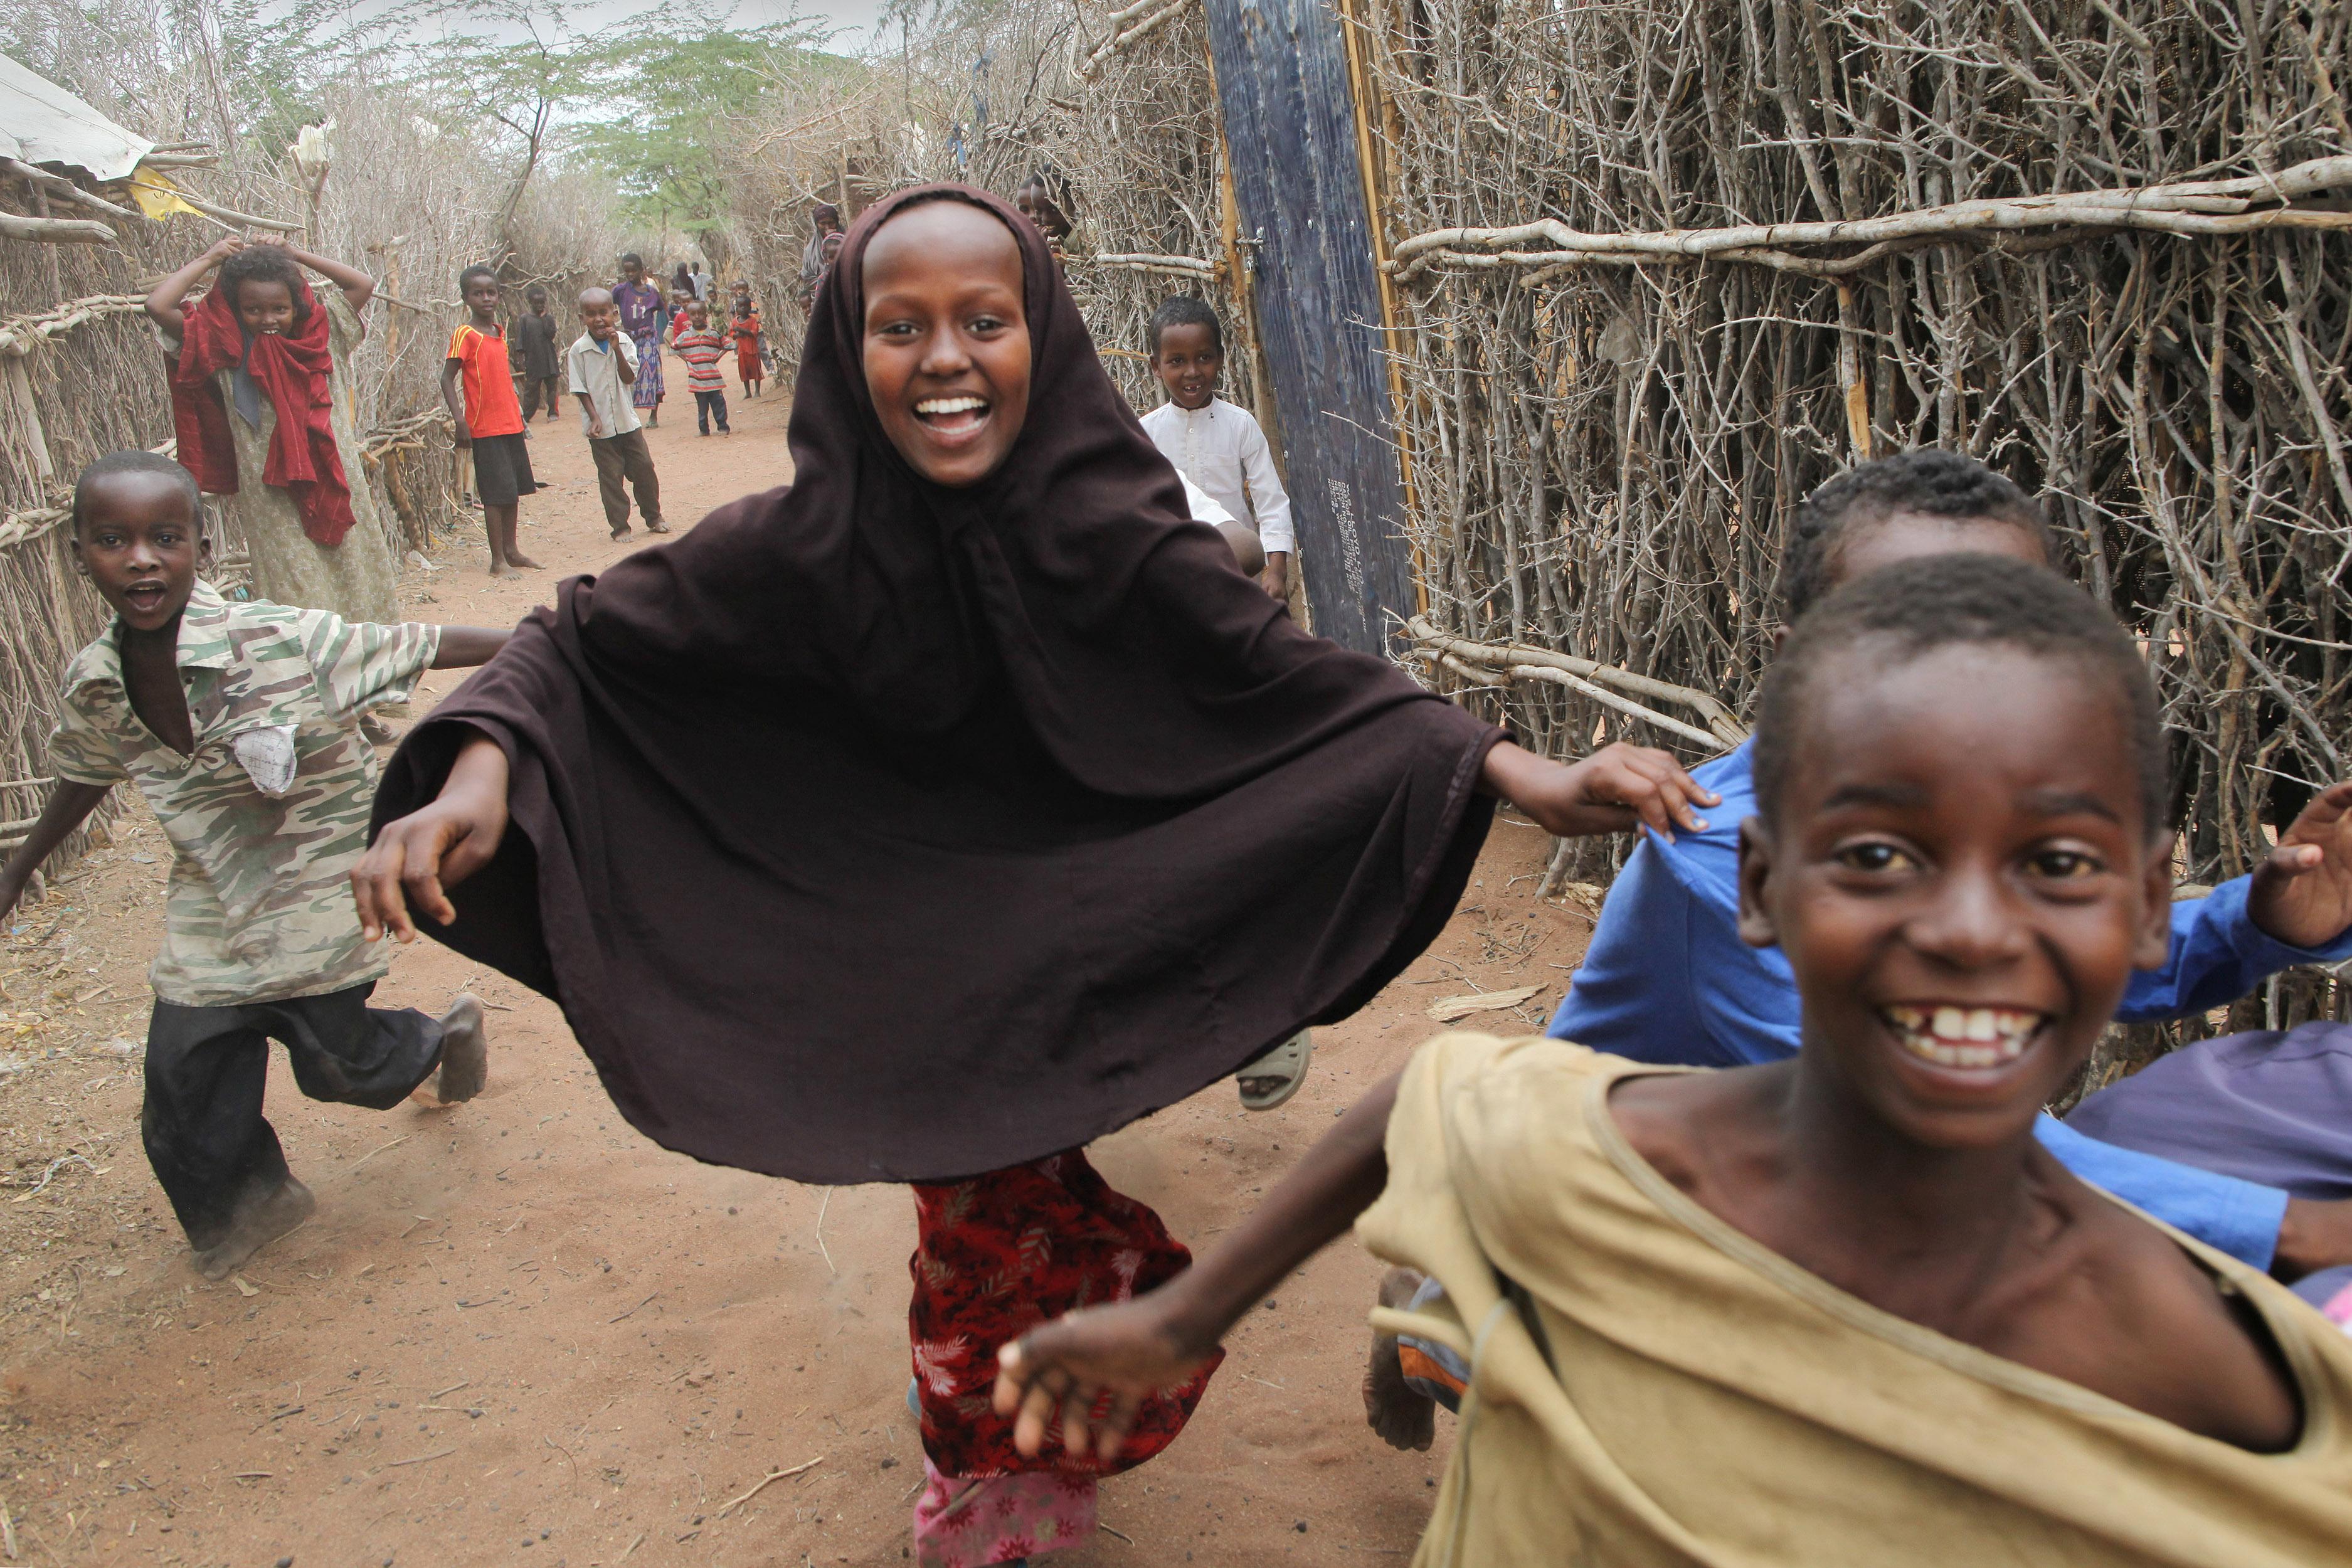 Children running in Dabab refugee camp in Kenya